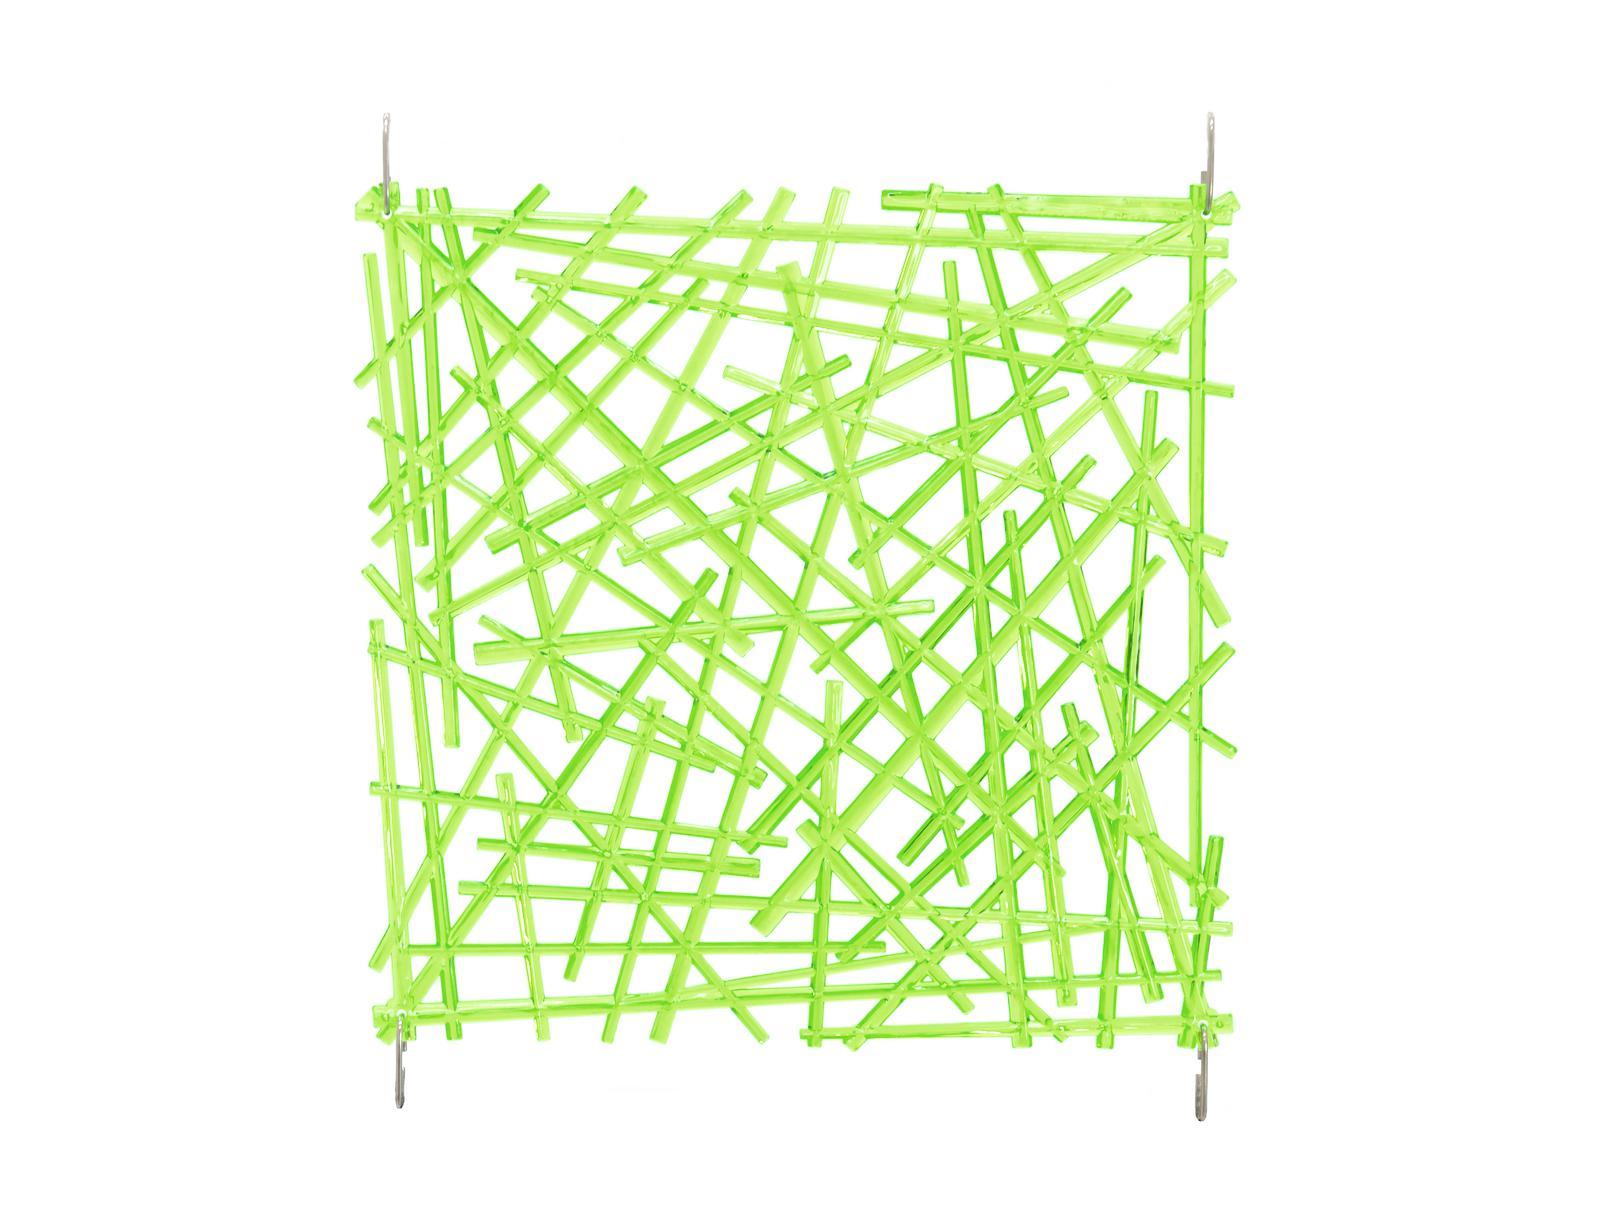 EUROPALMS divisorio Asta verde 4x in plastica